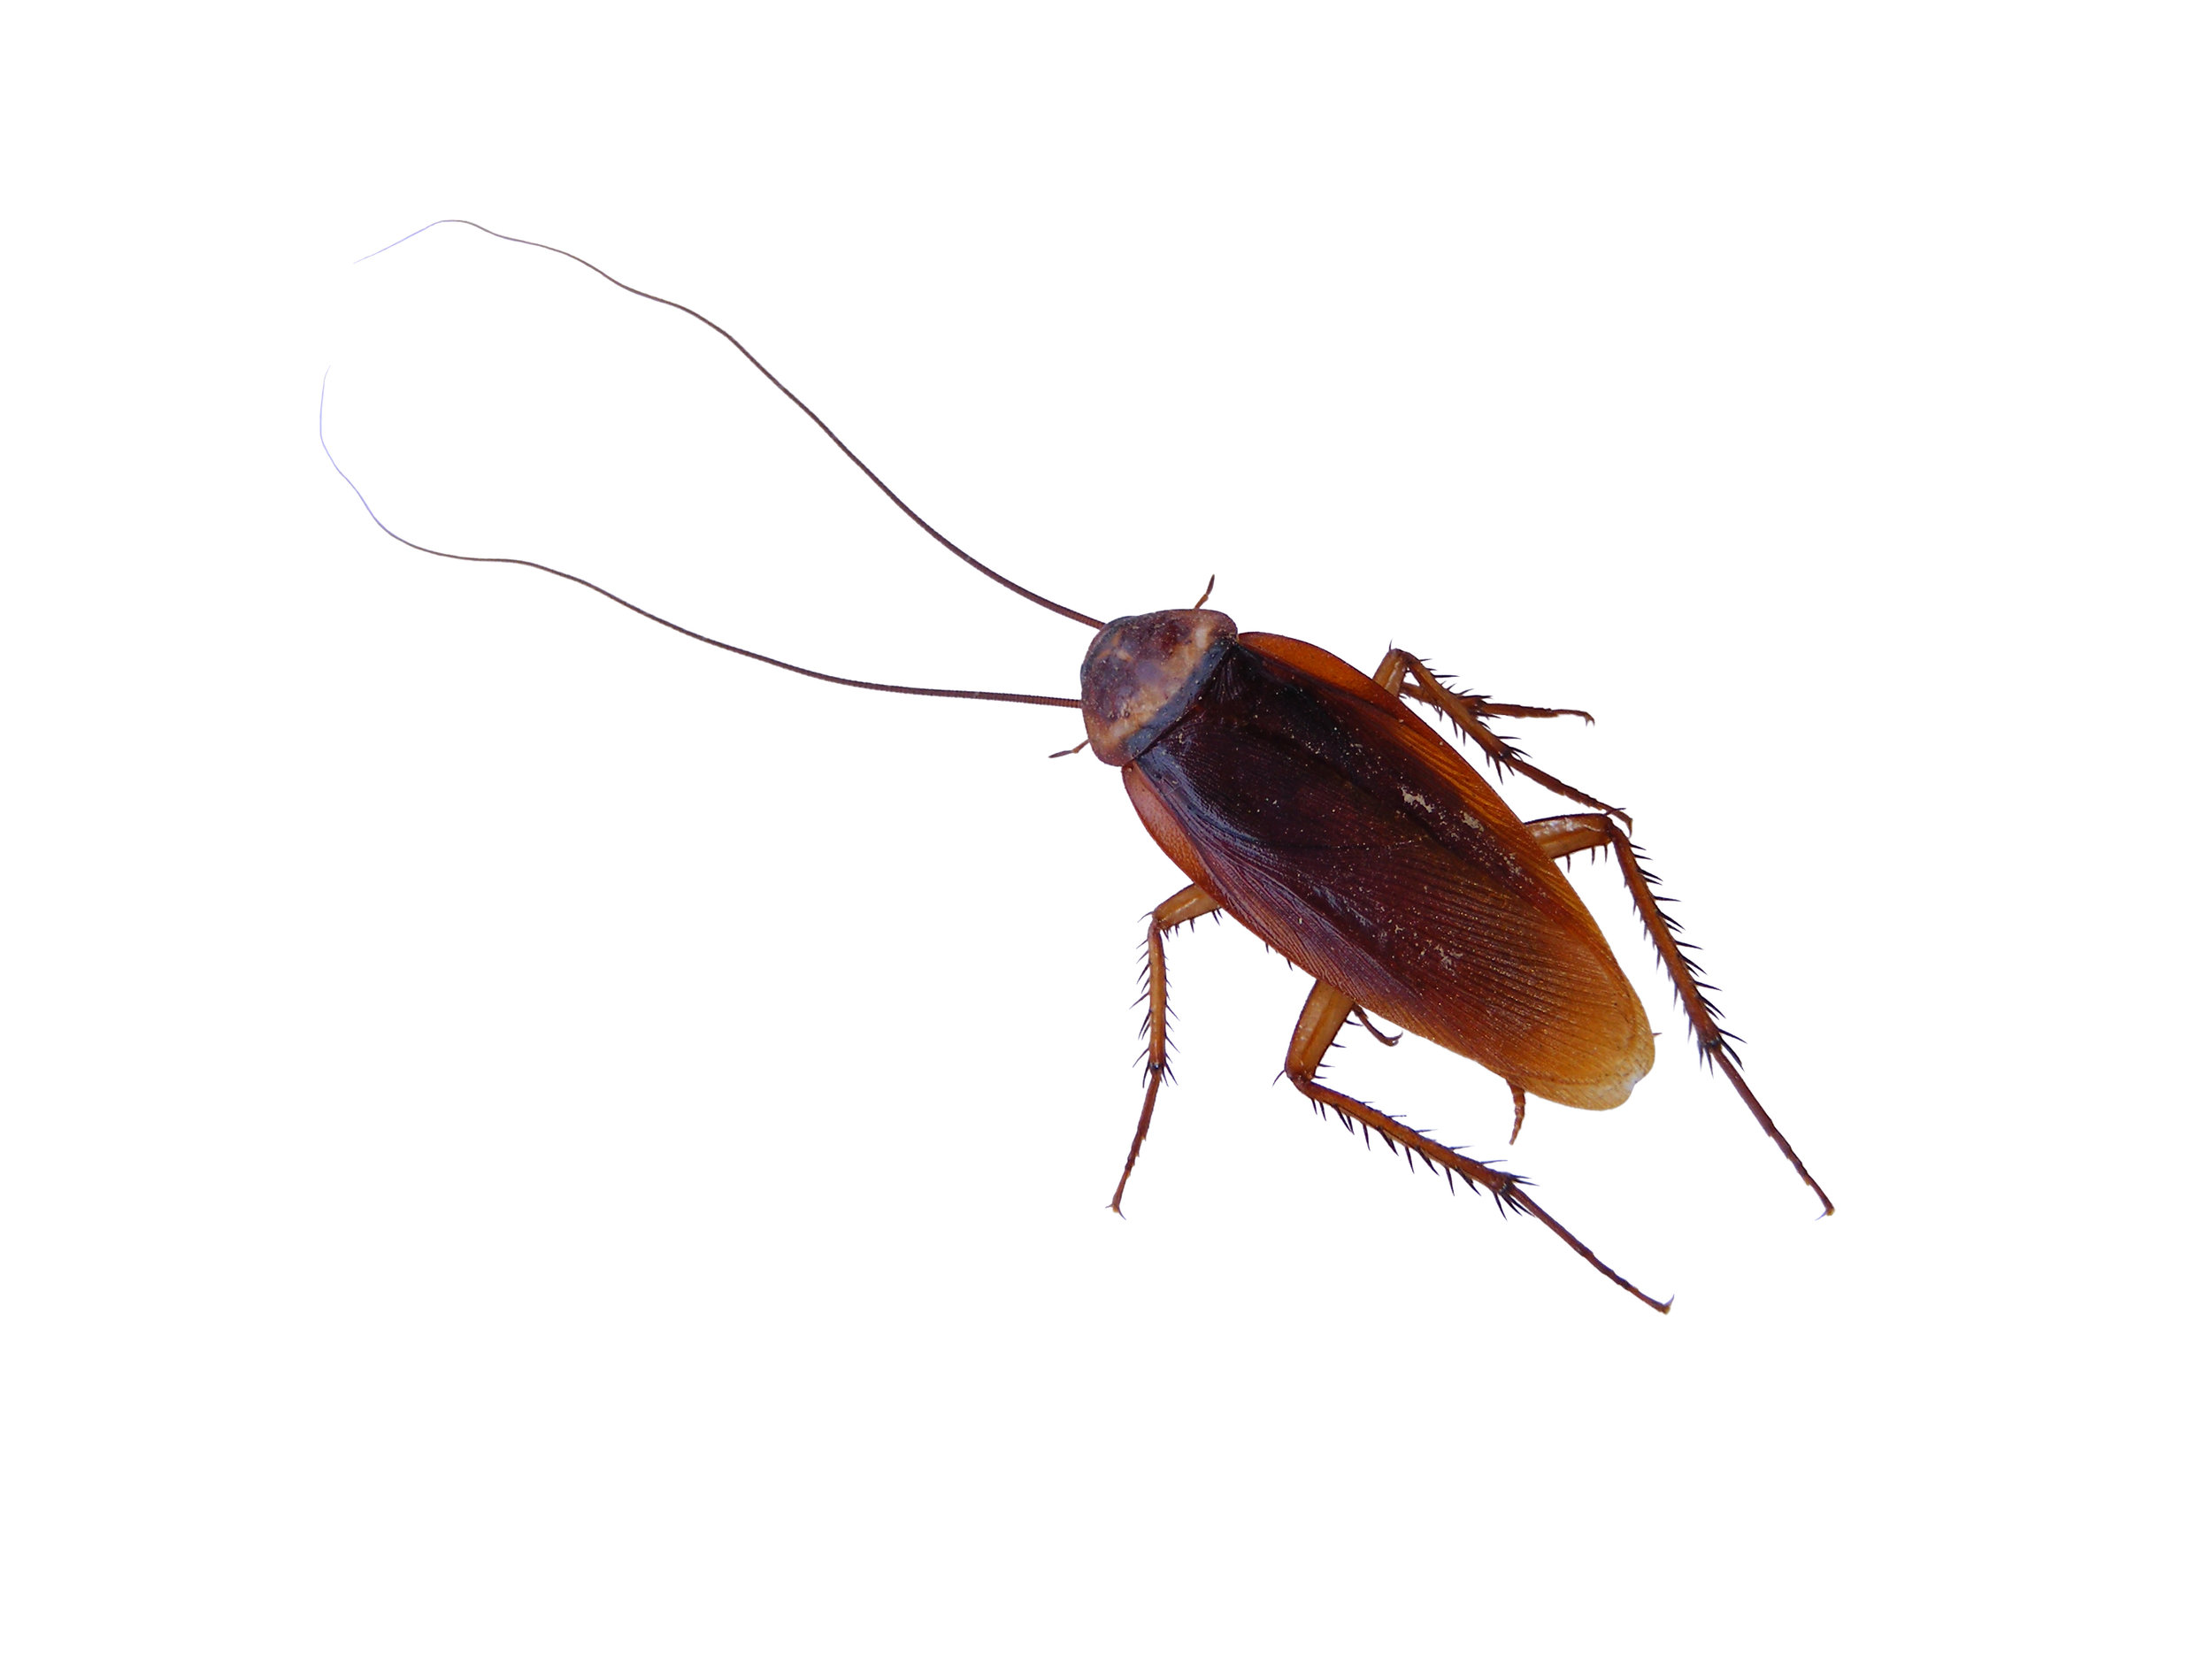 cockroach-1-1366992.jpg